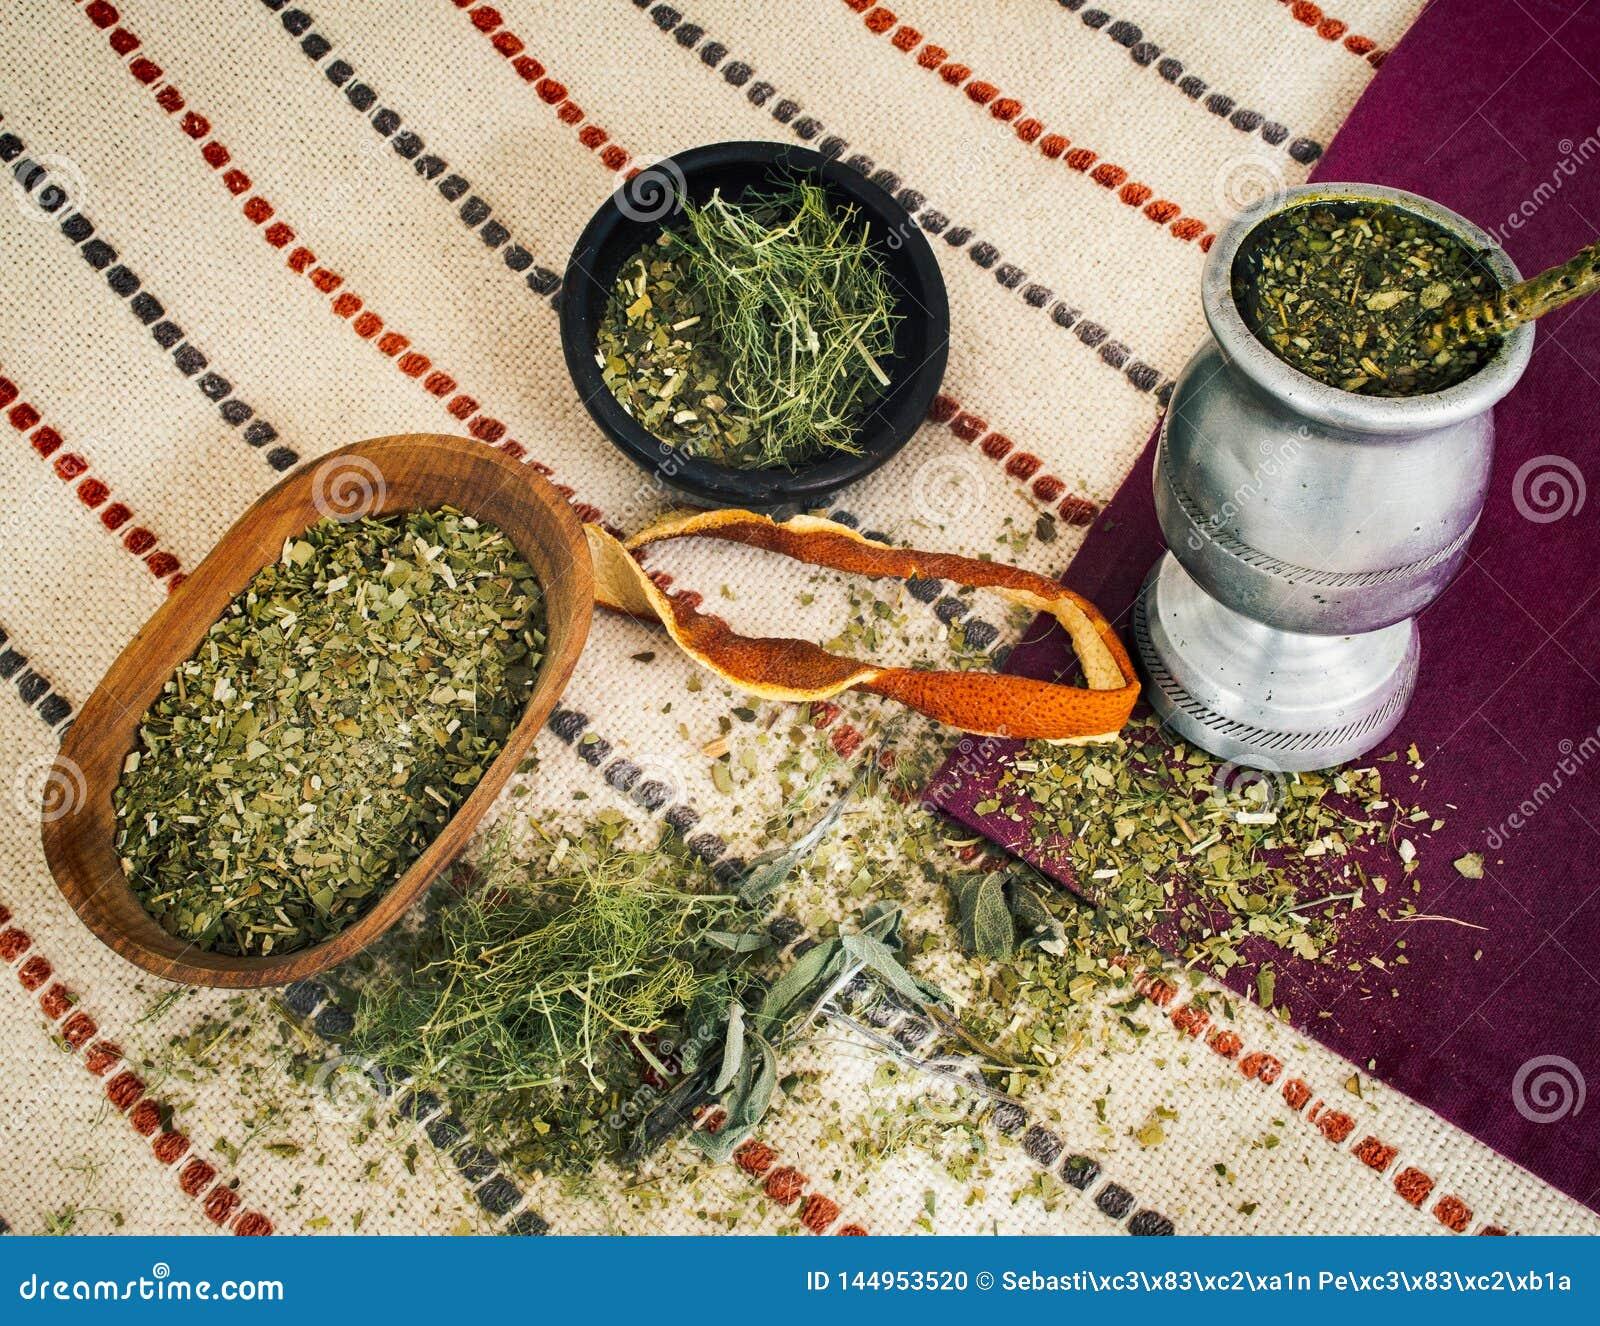 Mate tea with various herbs and orange peel